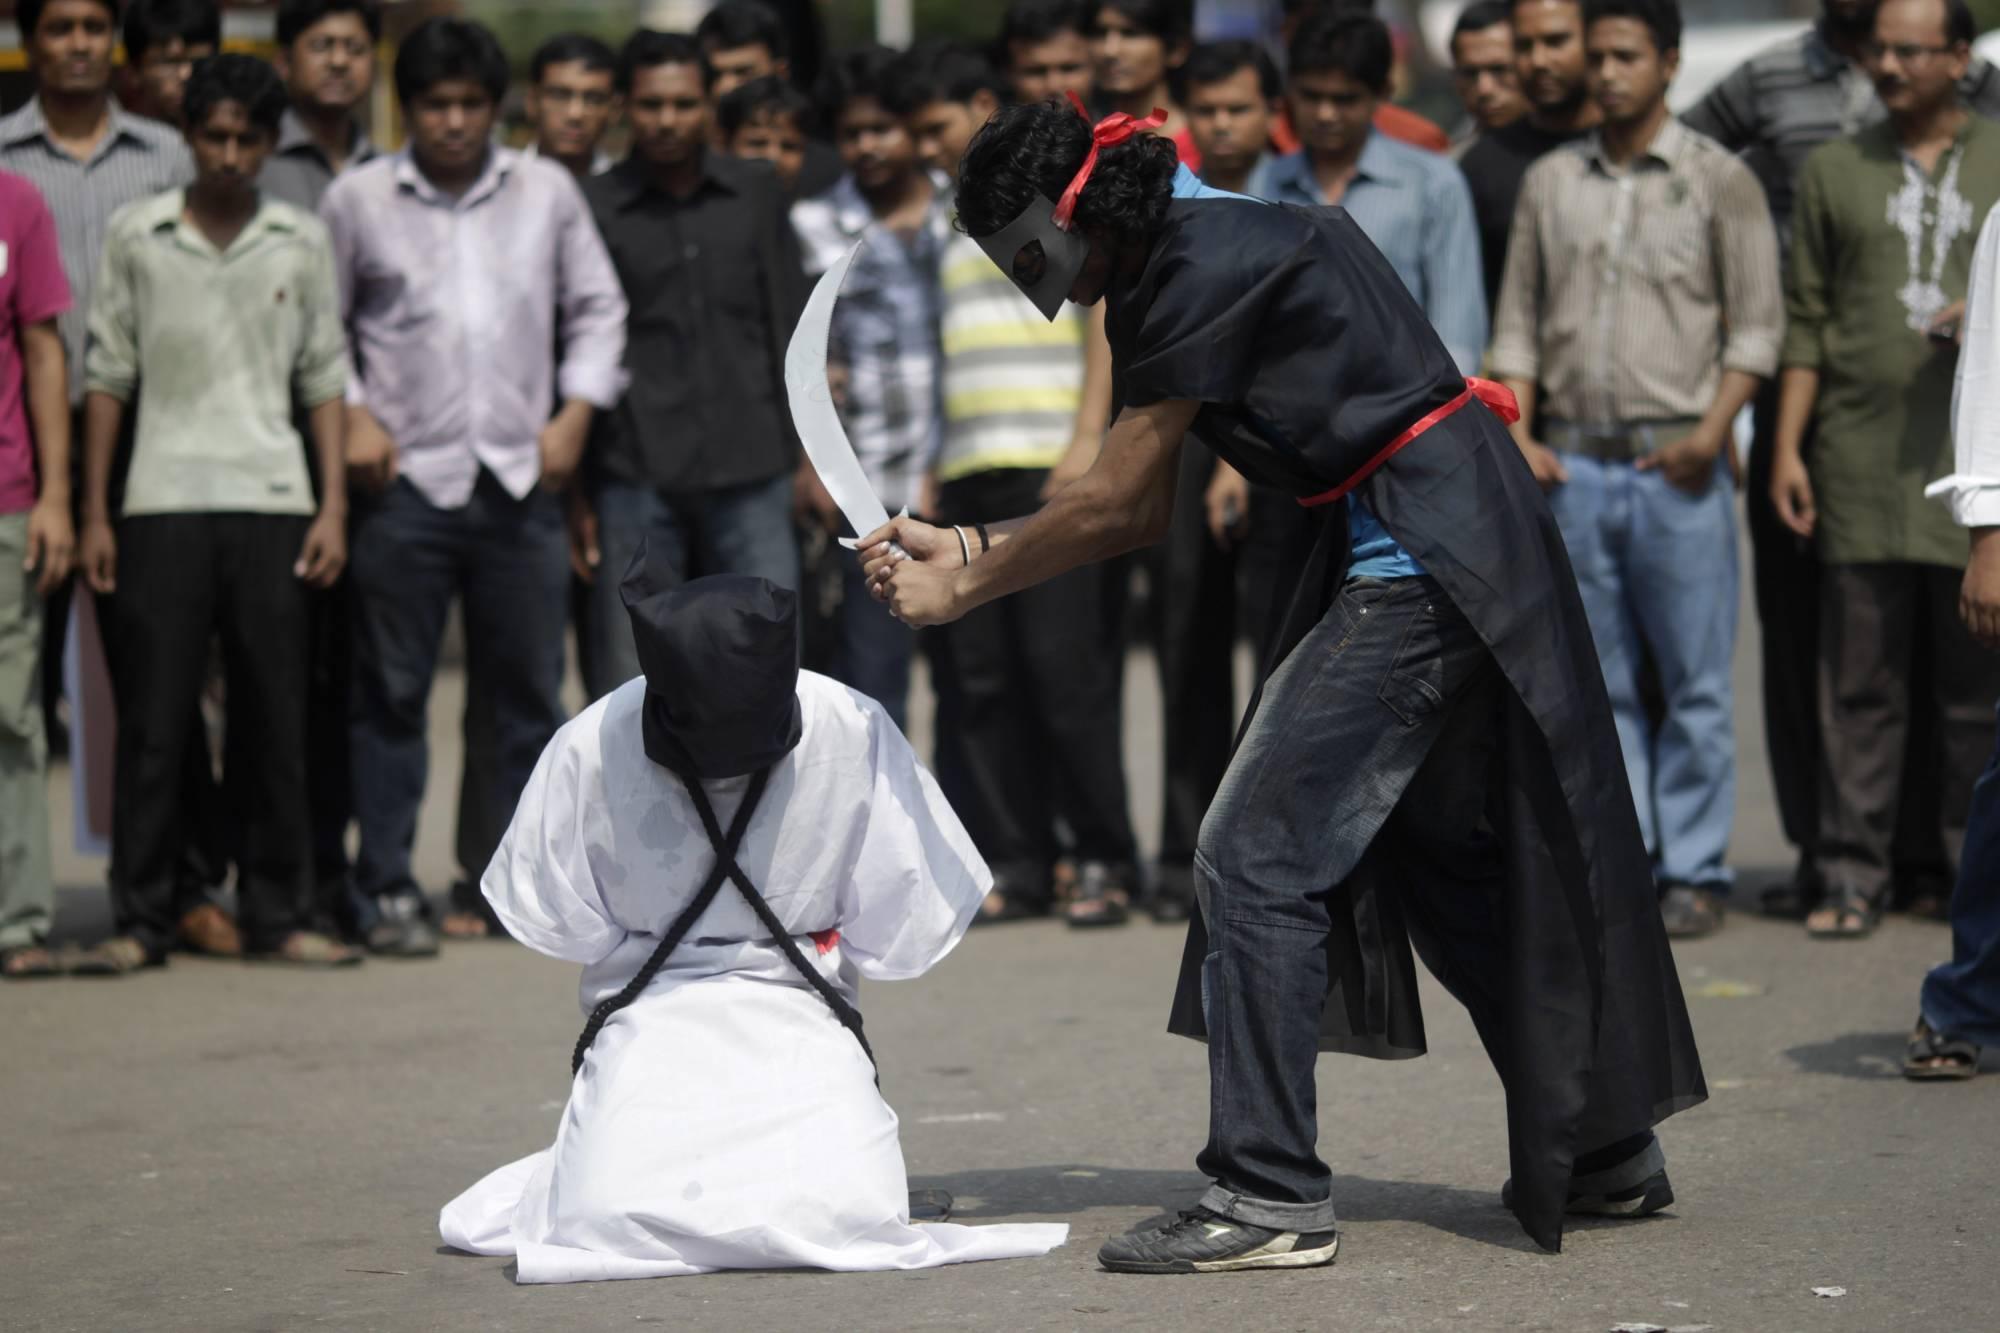 New Eye-Opening Documentary Completely Exposes Barbaric Saudi Regime